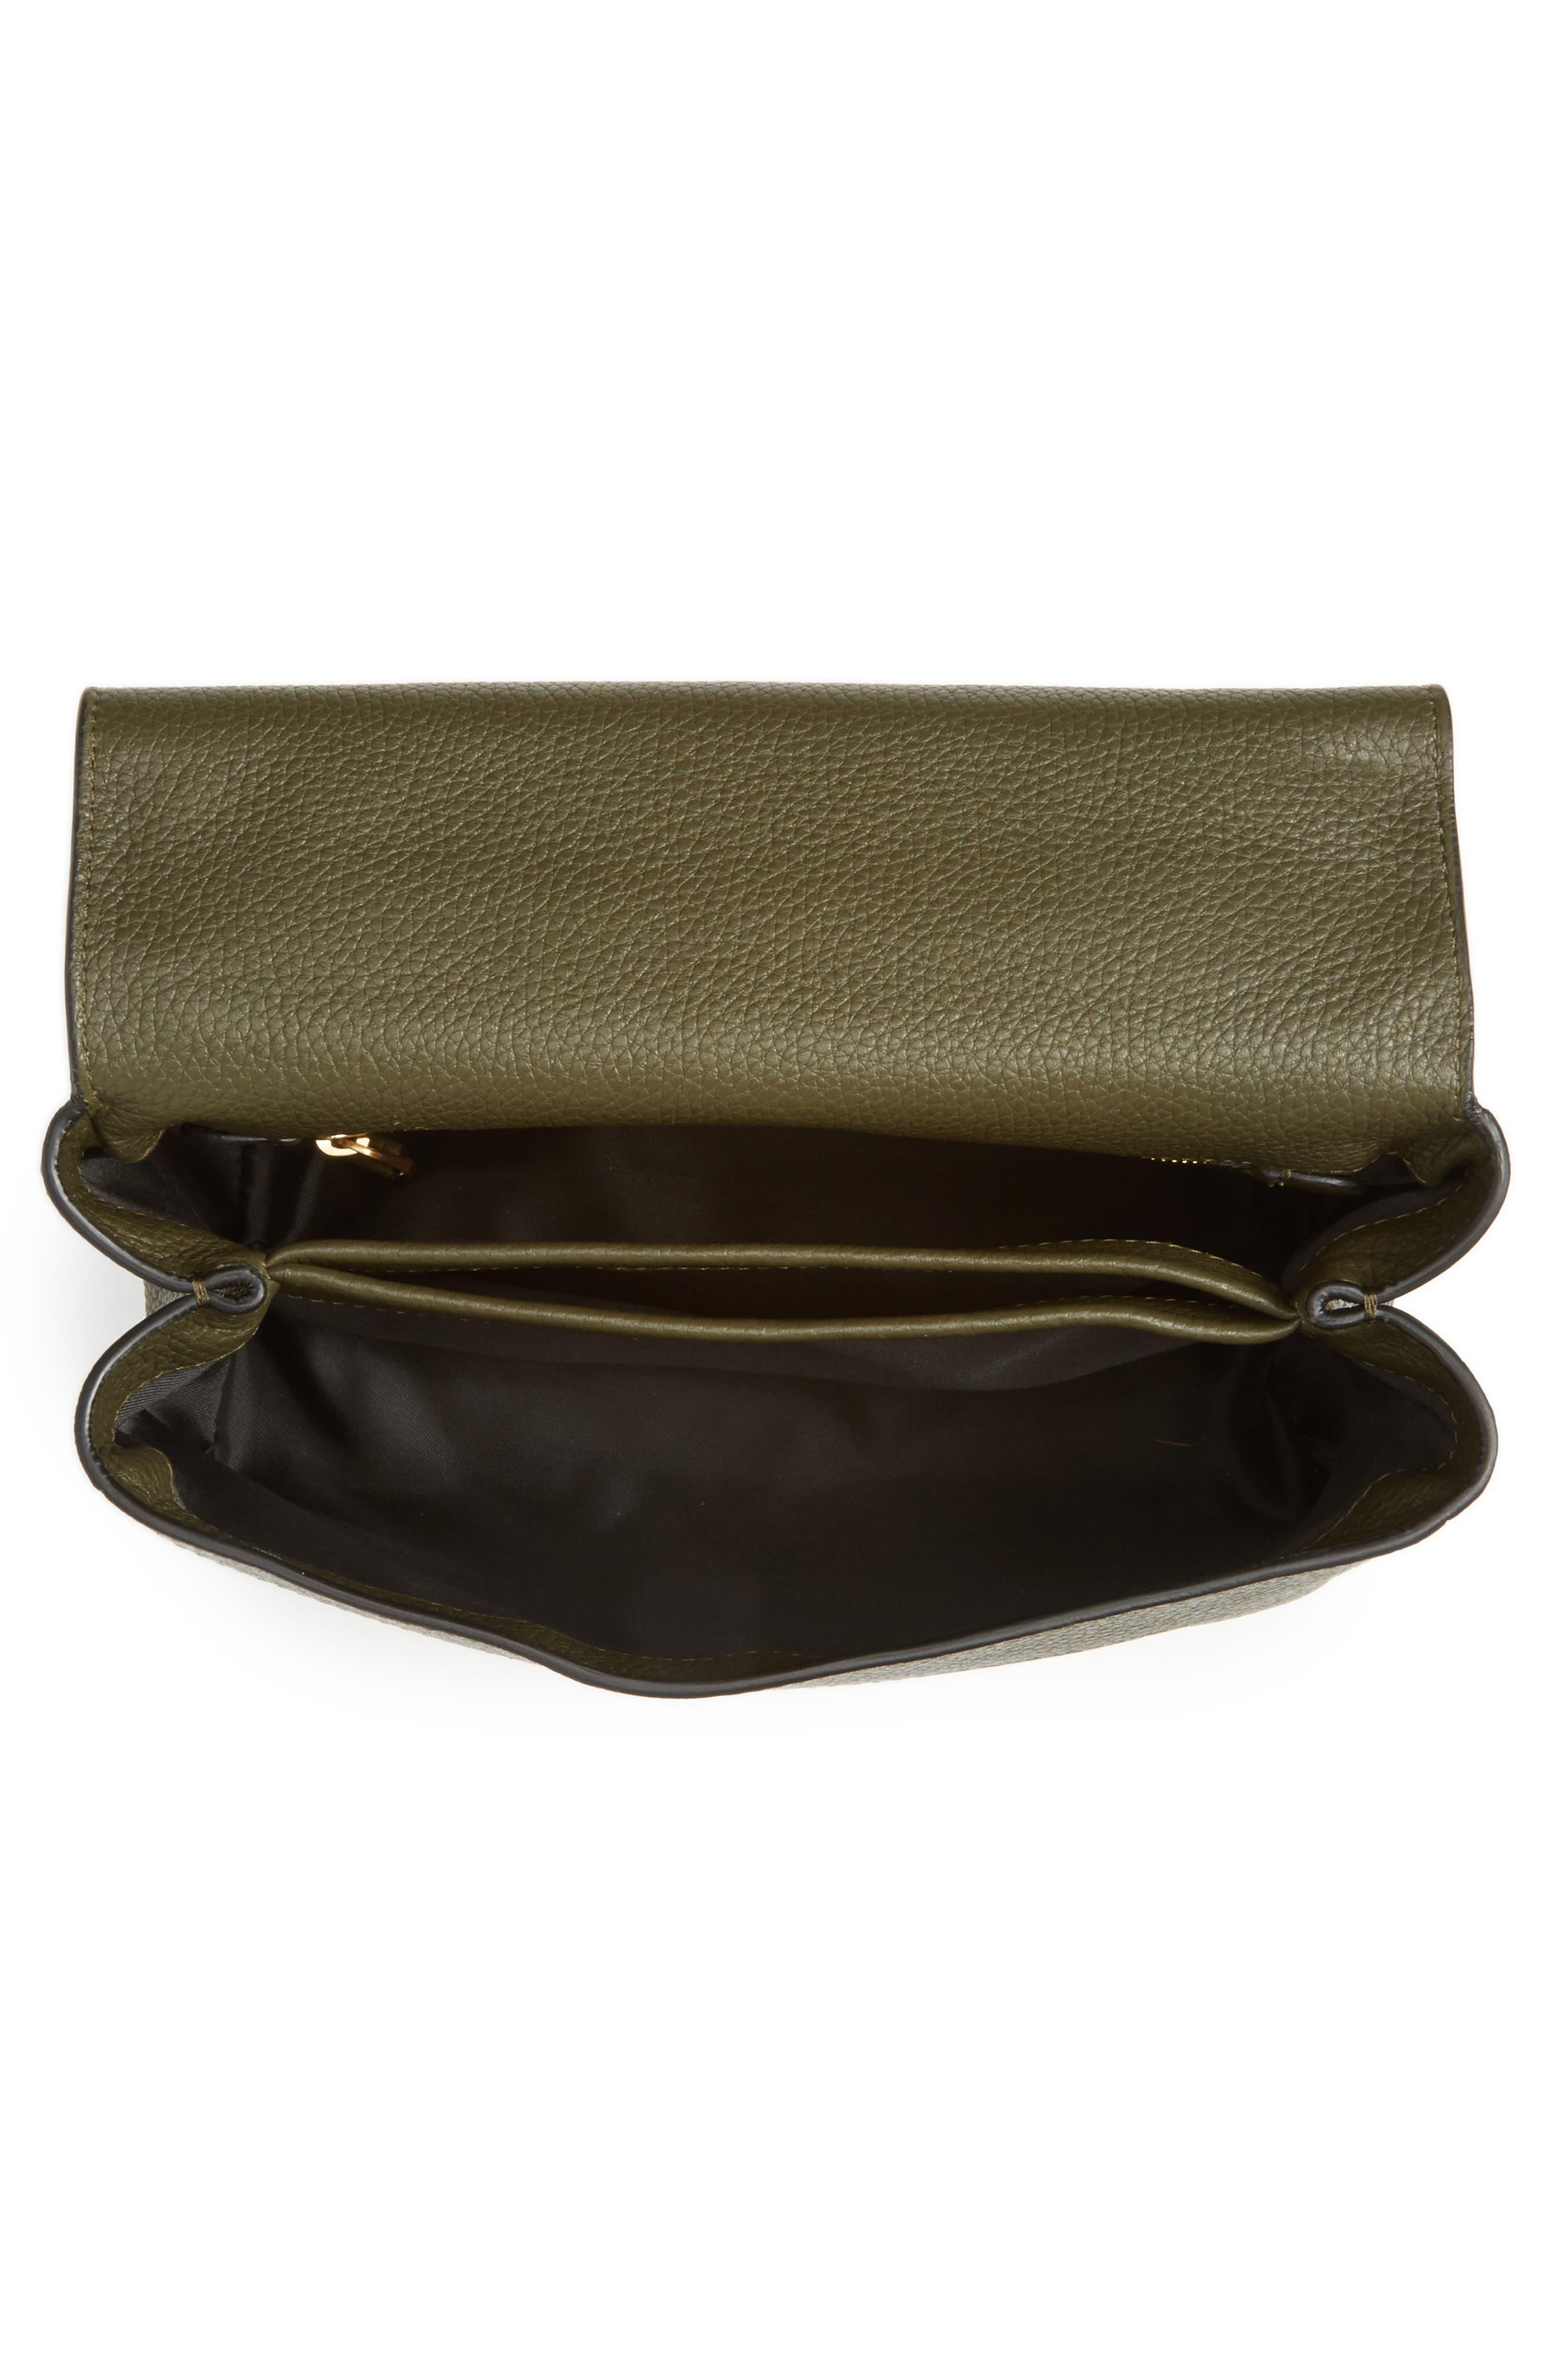 Grainy-B Leather Crossbody Bag,                             Alternate thumbnail 7, color,